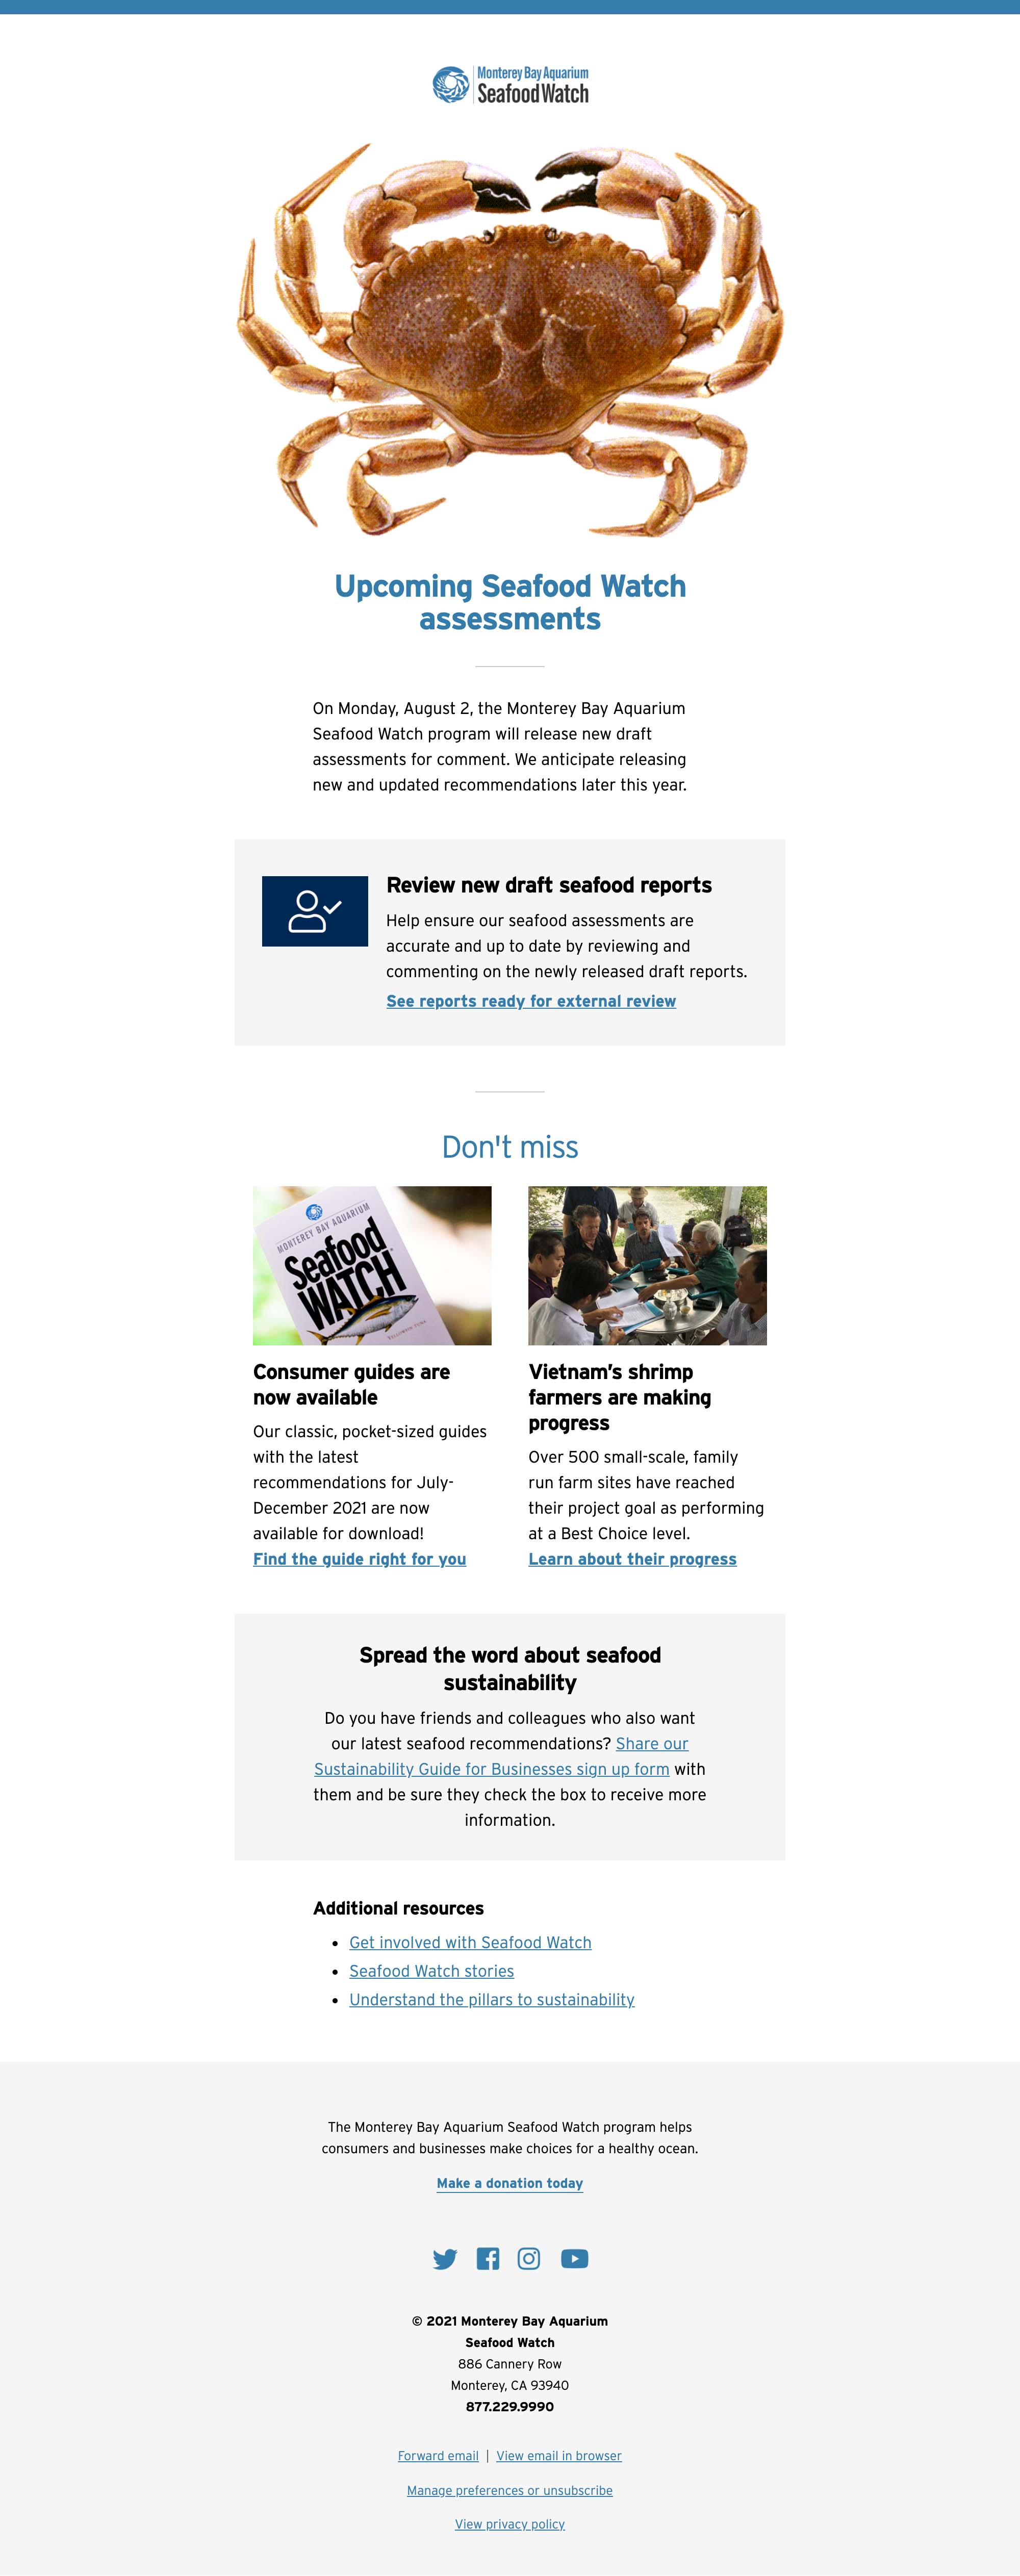 Seafood Watch Recommendation Updates - August 2020 - desktop view